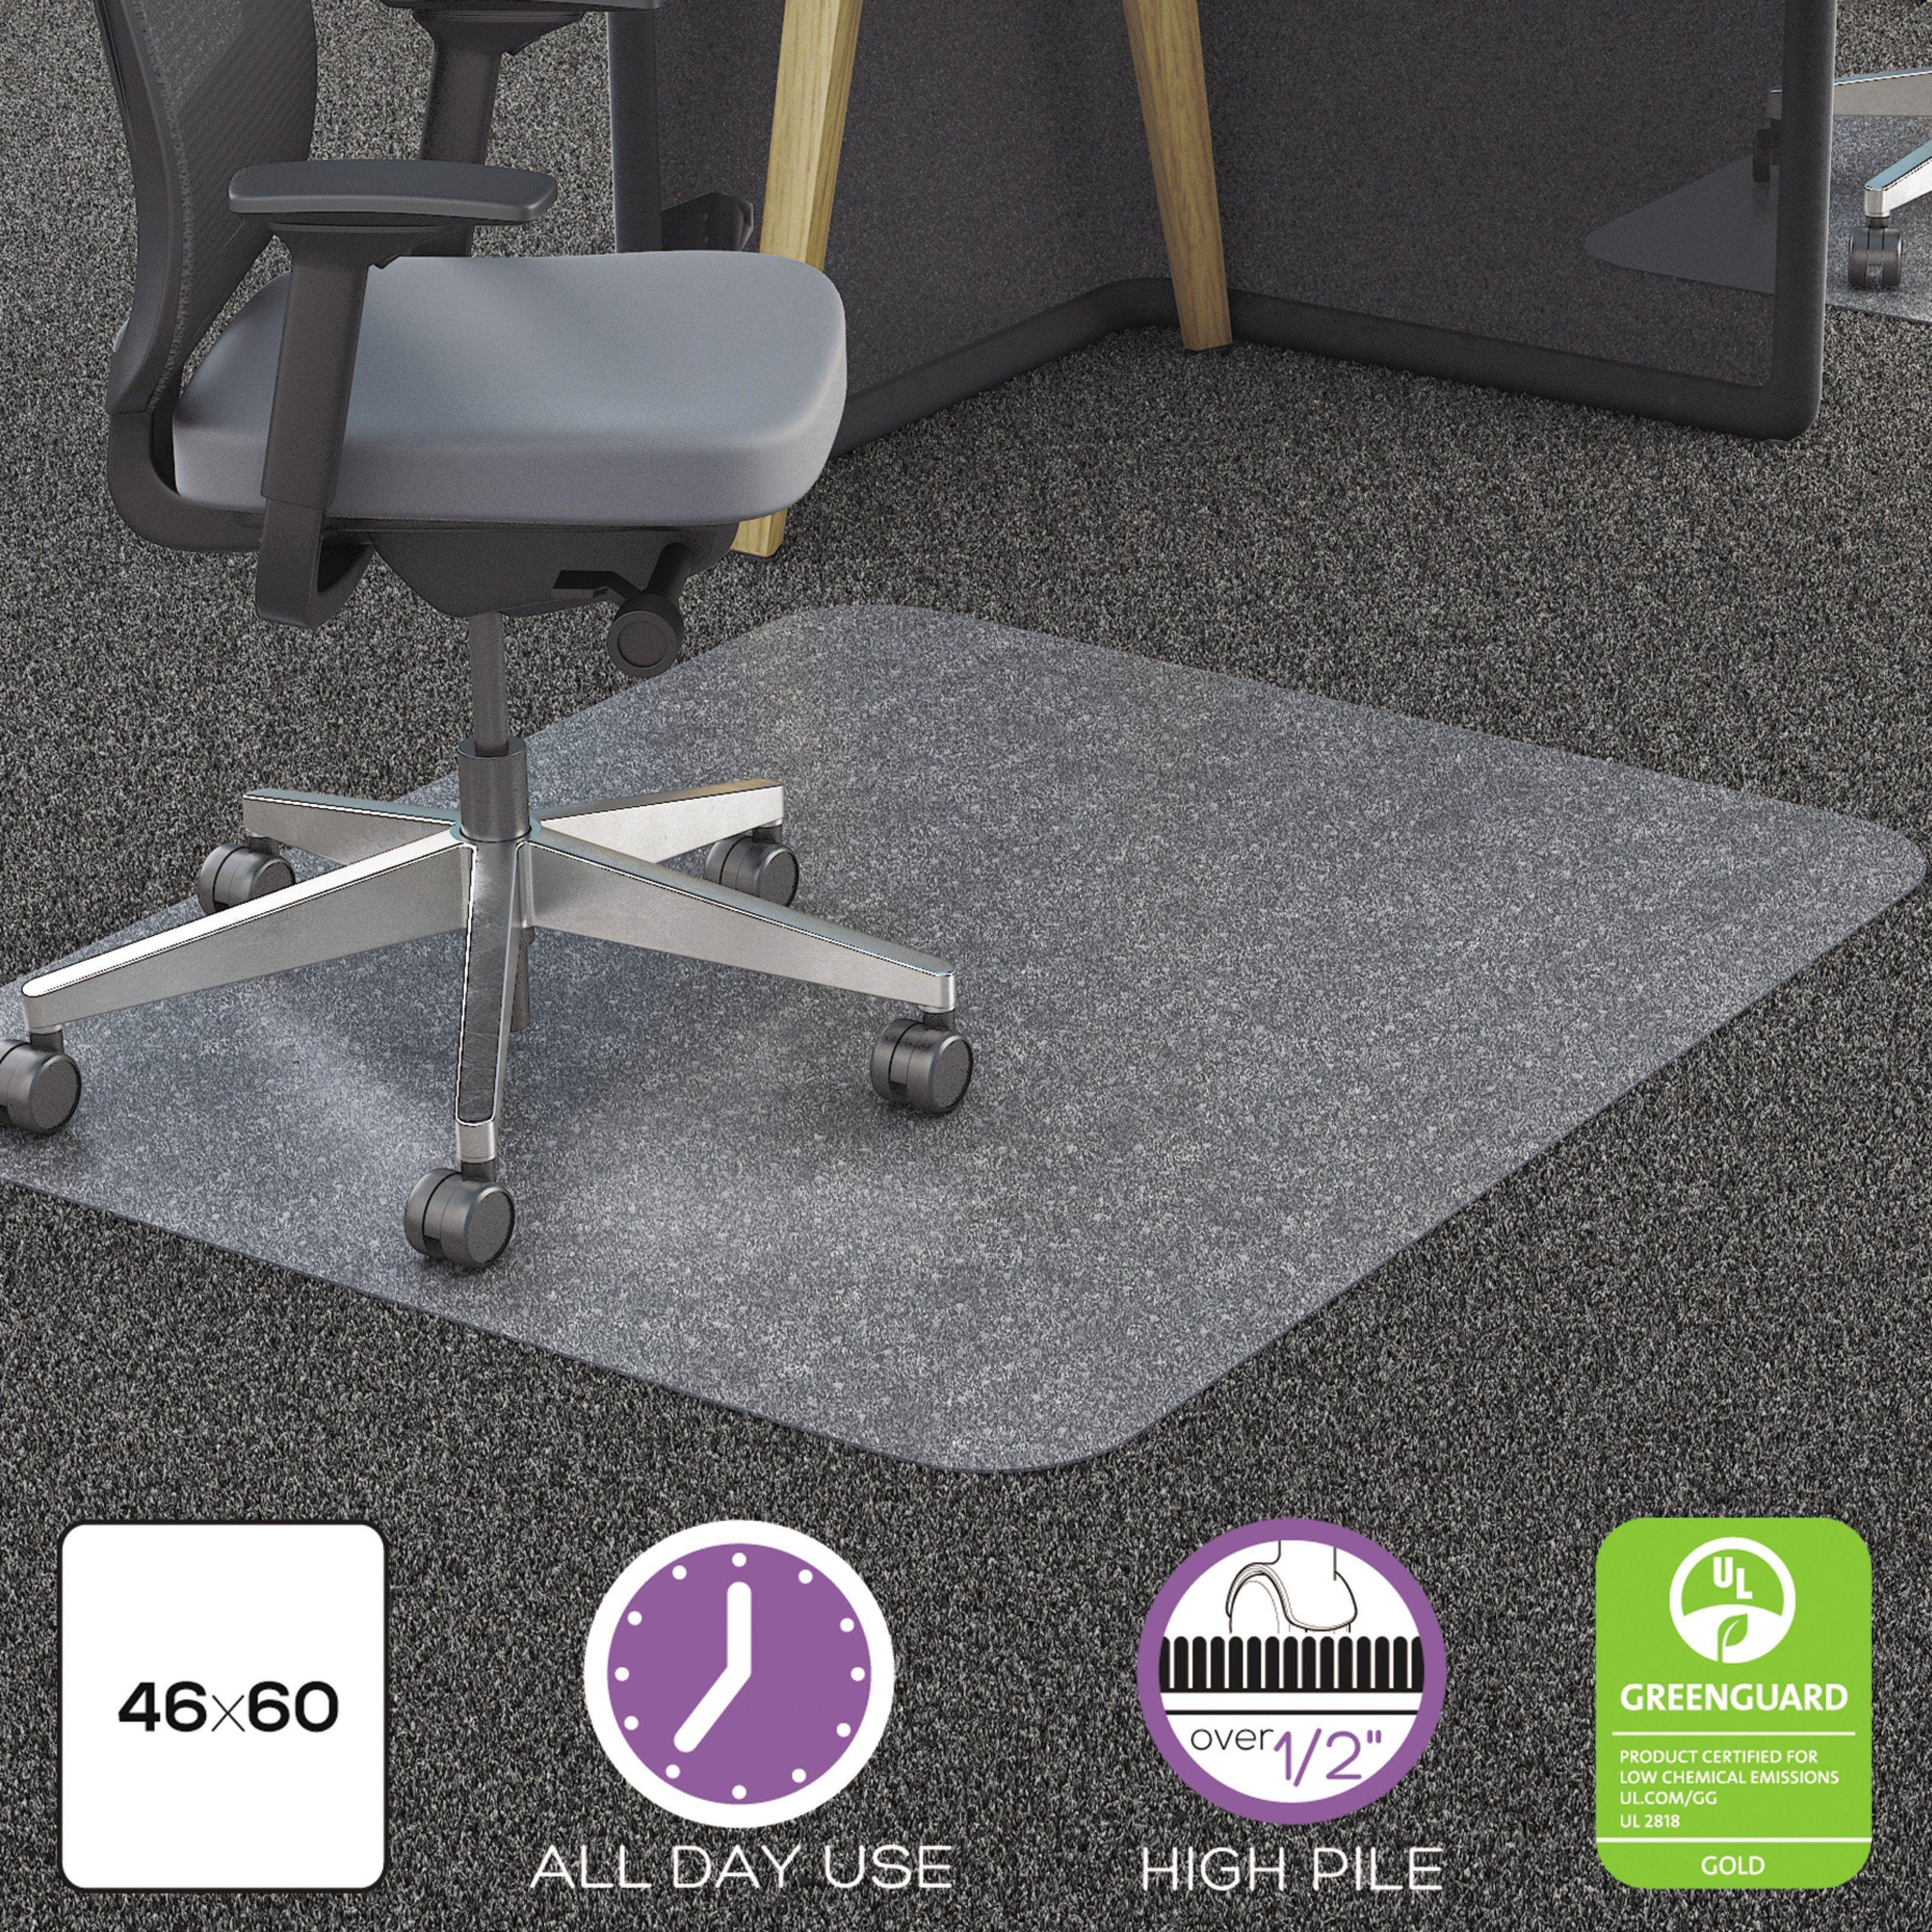 Deflecto 46 x 60 chair mat for all pile carpet